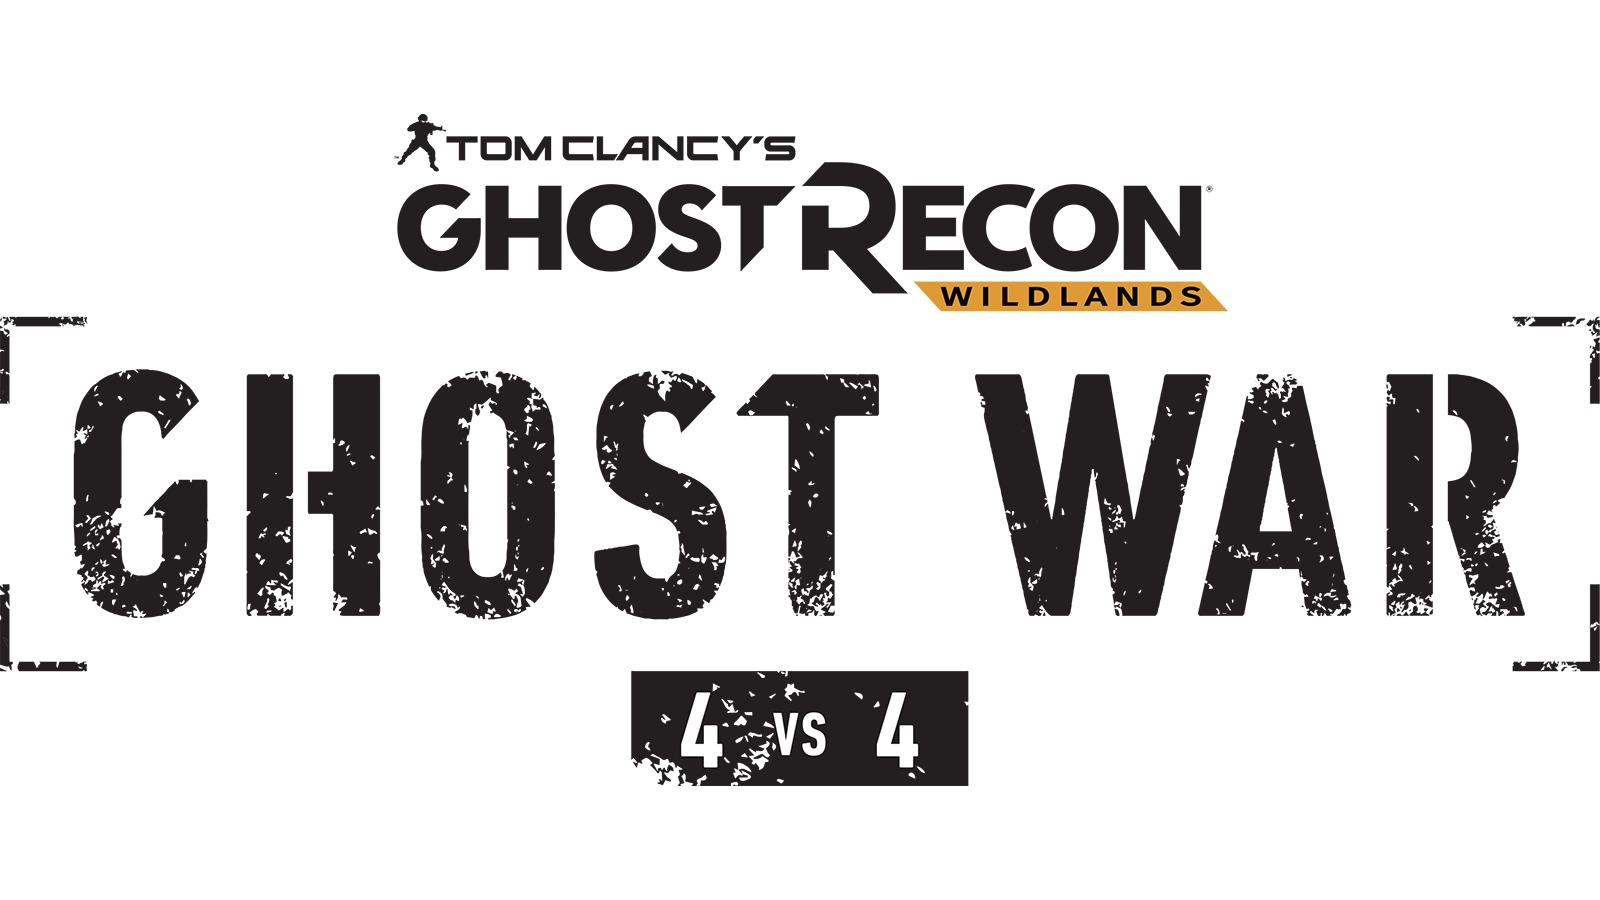 Endelig blir det spiller-mot-spiller flerspiller i Ghost Recon Wildlands - og betaen kommer allerede i sommer.